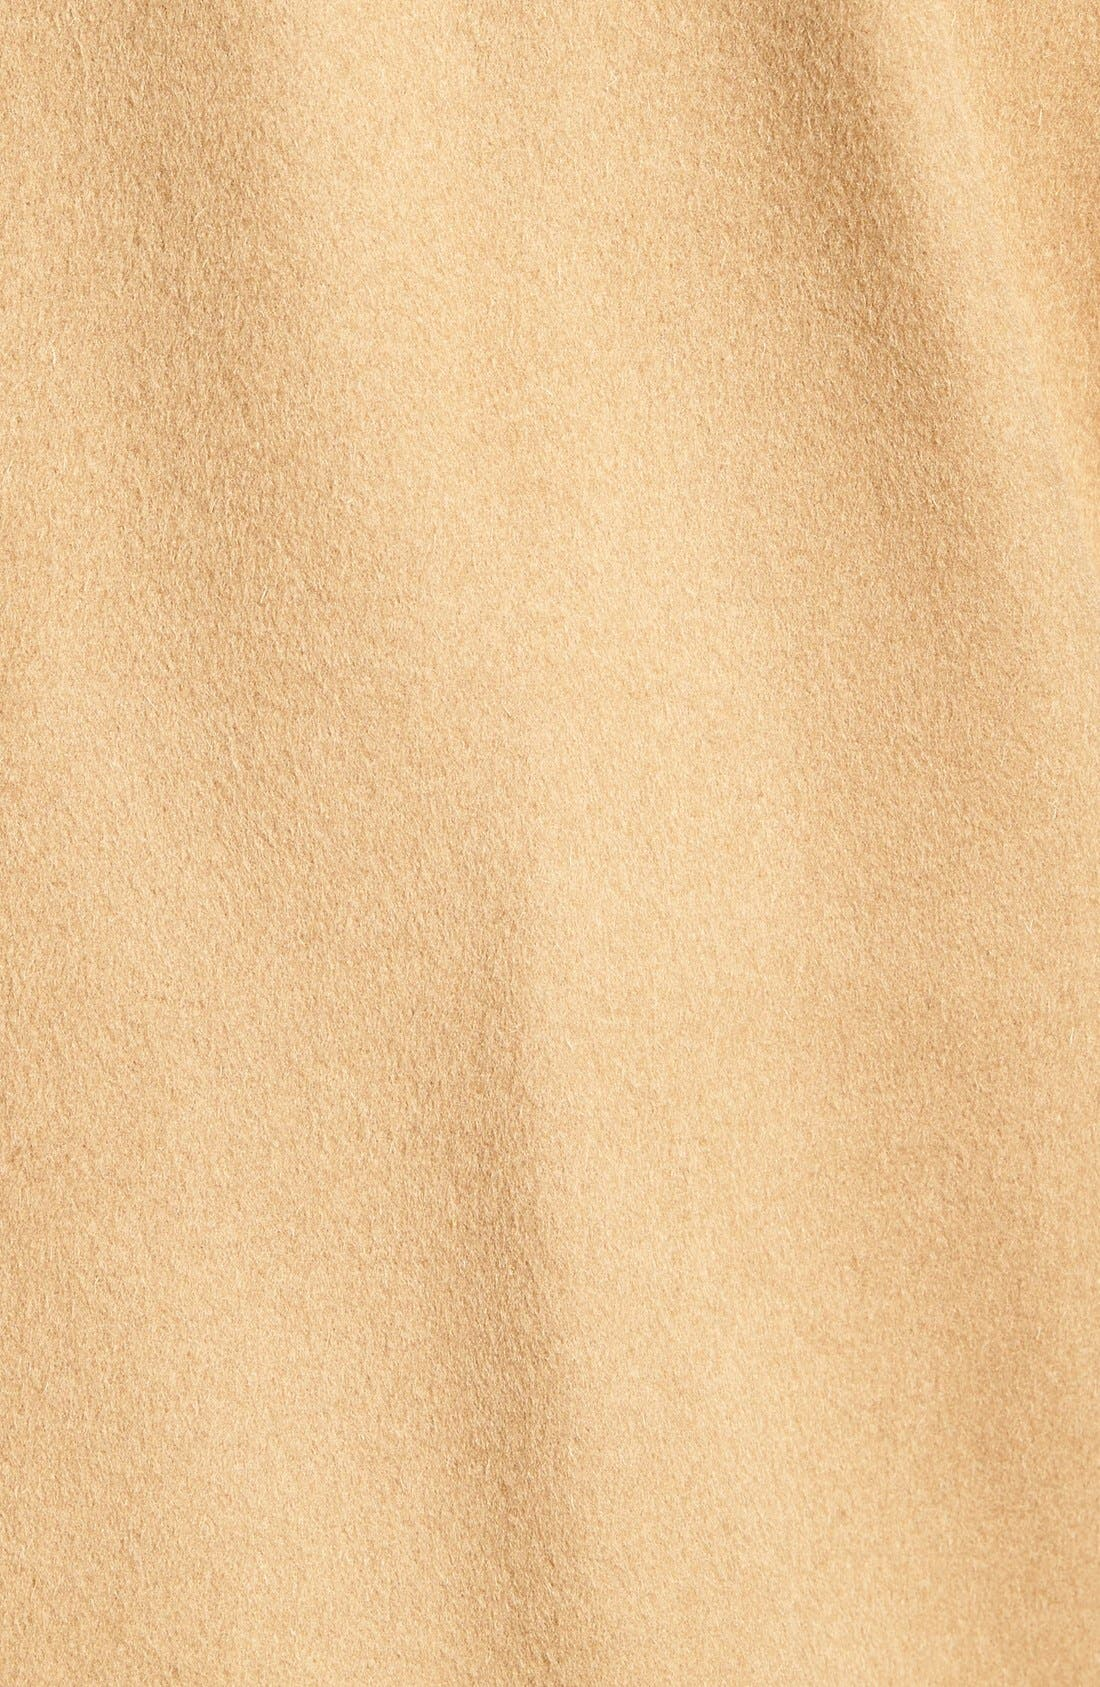 Douglas Modern Fit Wool & Cashmere Overcoat,                             Alternate thumbnail 5, color,                             Camel